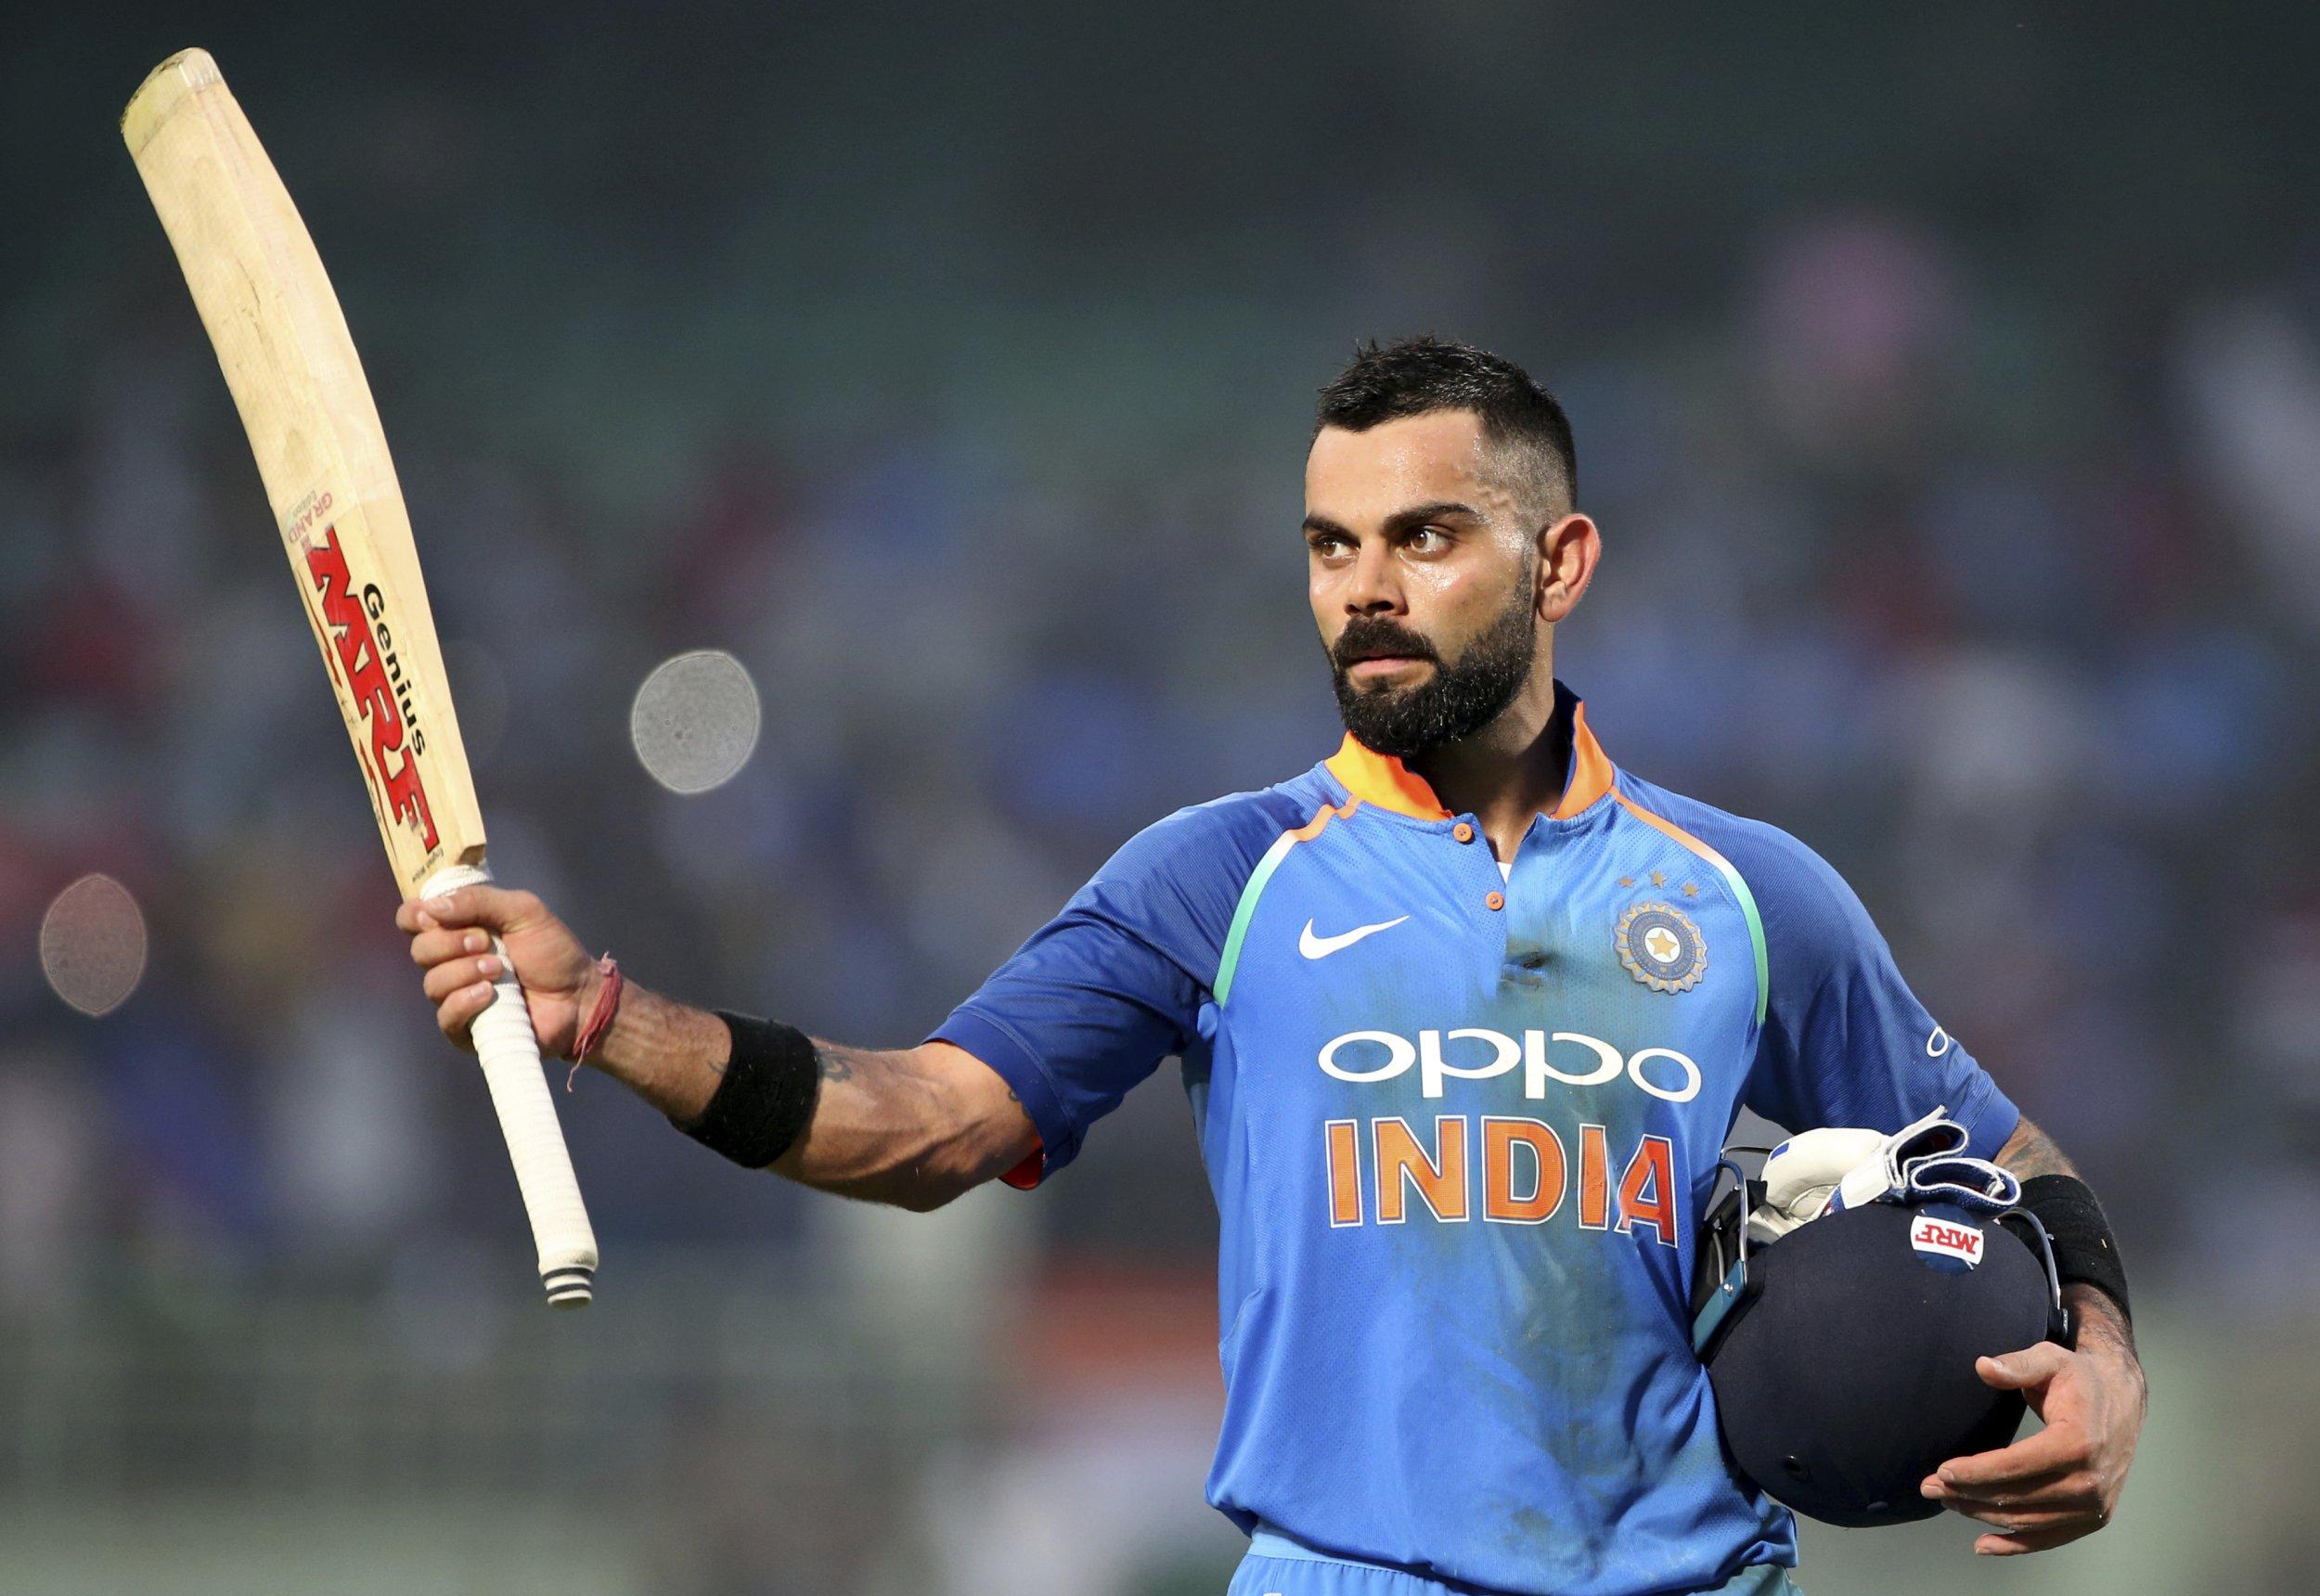 Virat Kohli breaks Sachin Tendulkar record to become fastest batsman to reach 10,000 ODI runs